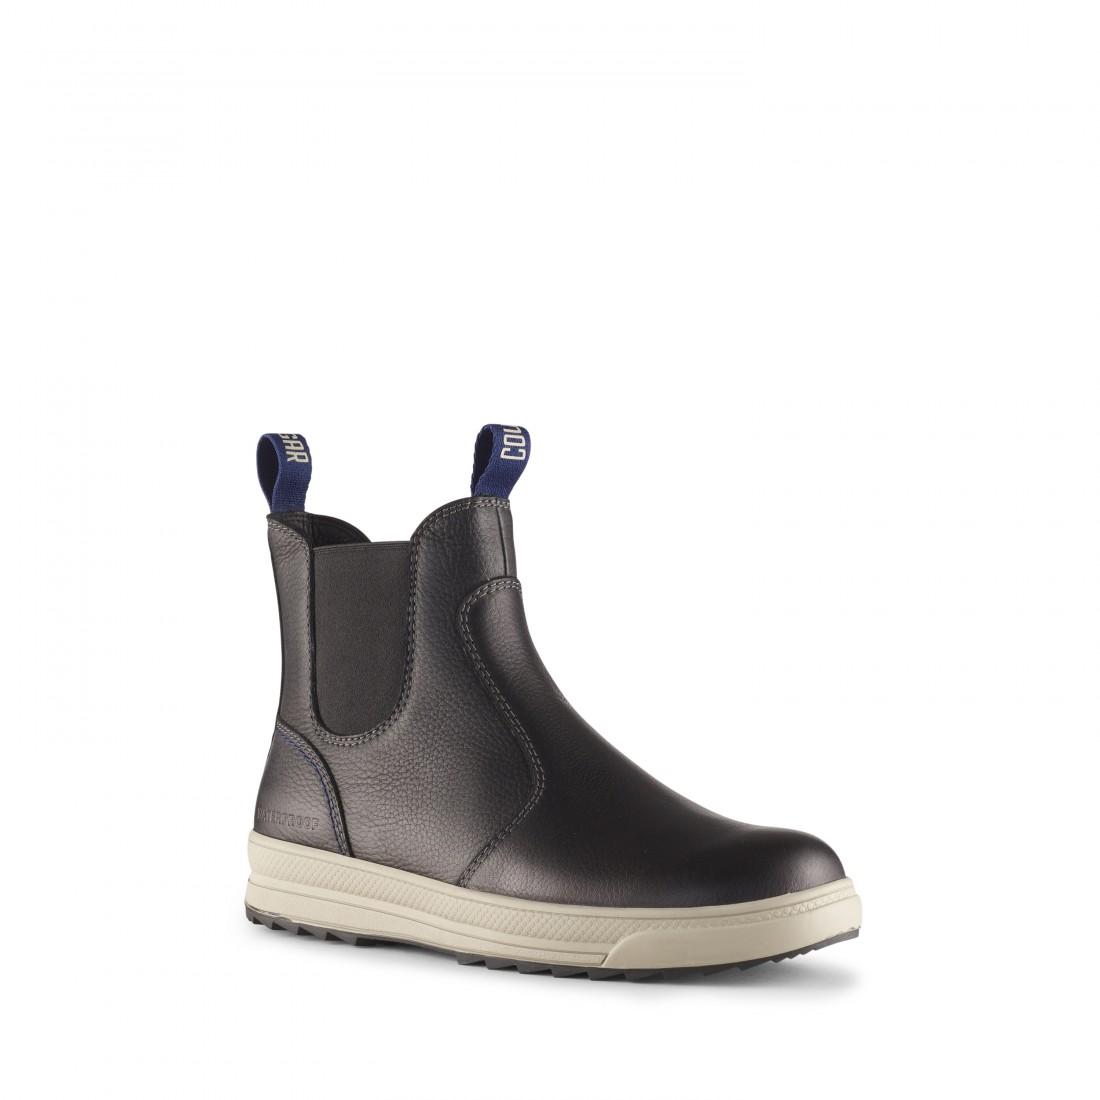 Crowley Leather Black 2 W